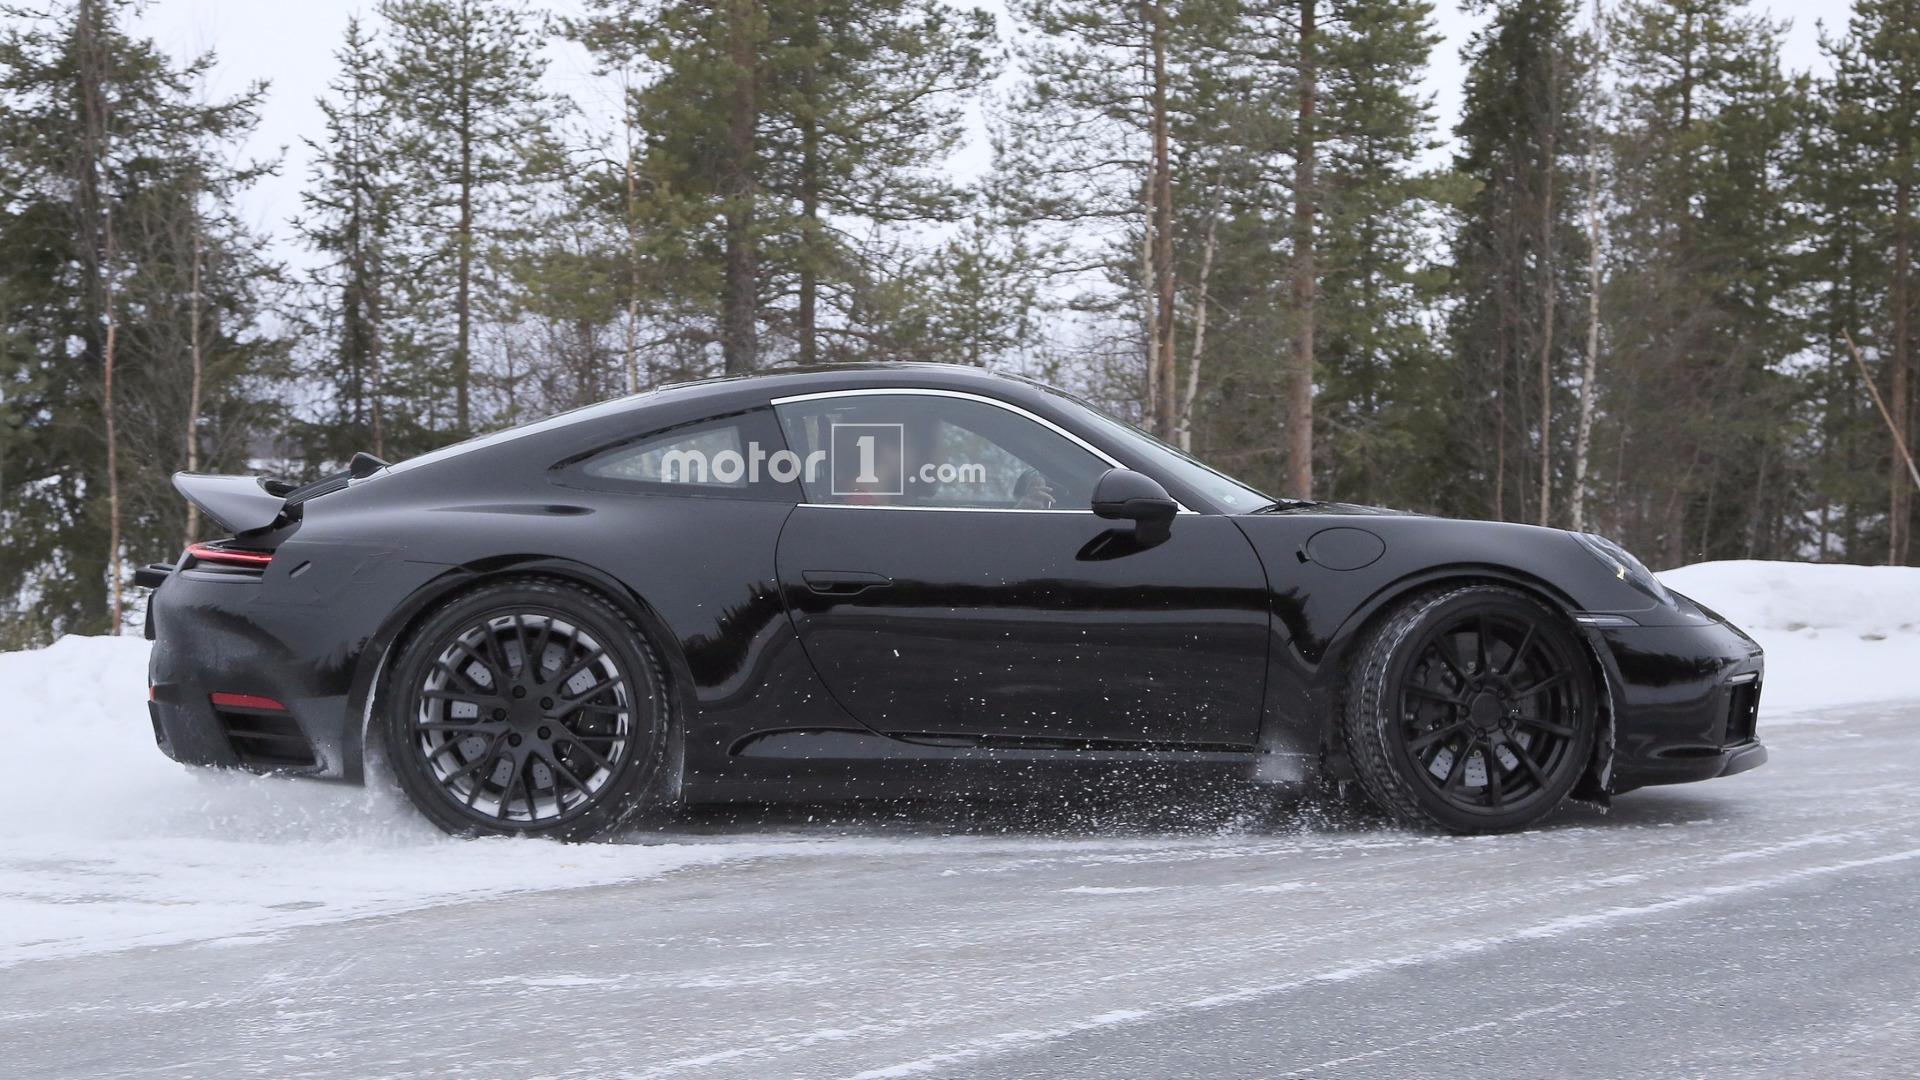 2019 Porsche 911 Turbo S >> 2019 Porsche 911 Spied With Mission E Taillights Update